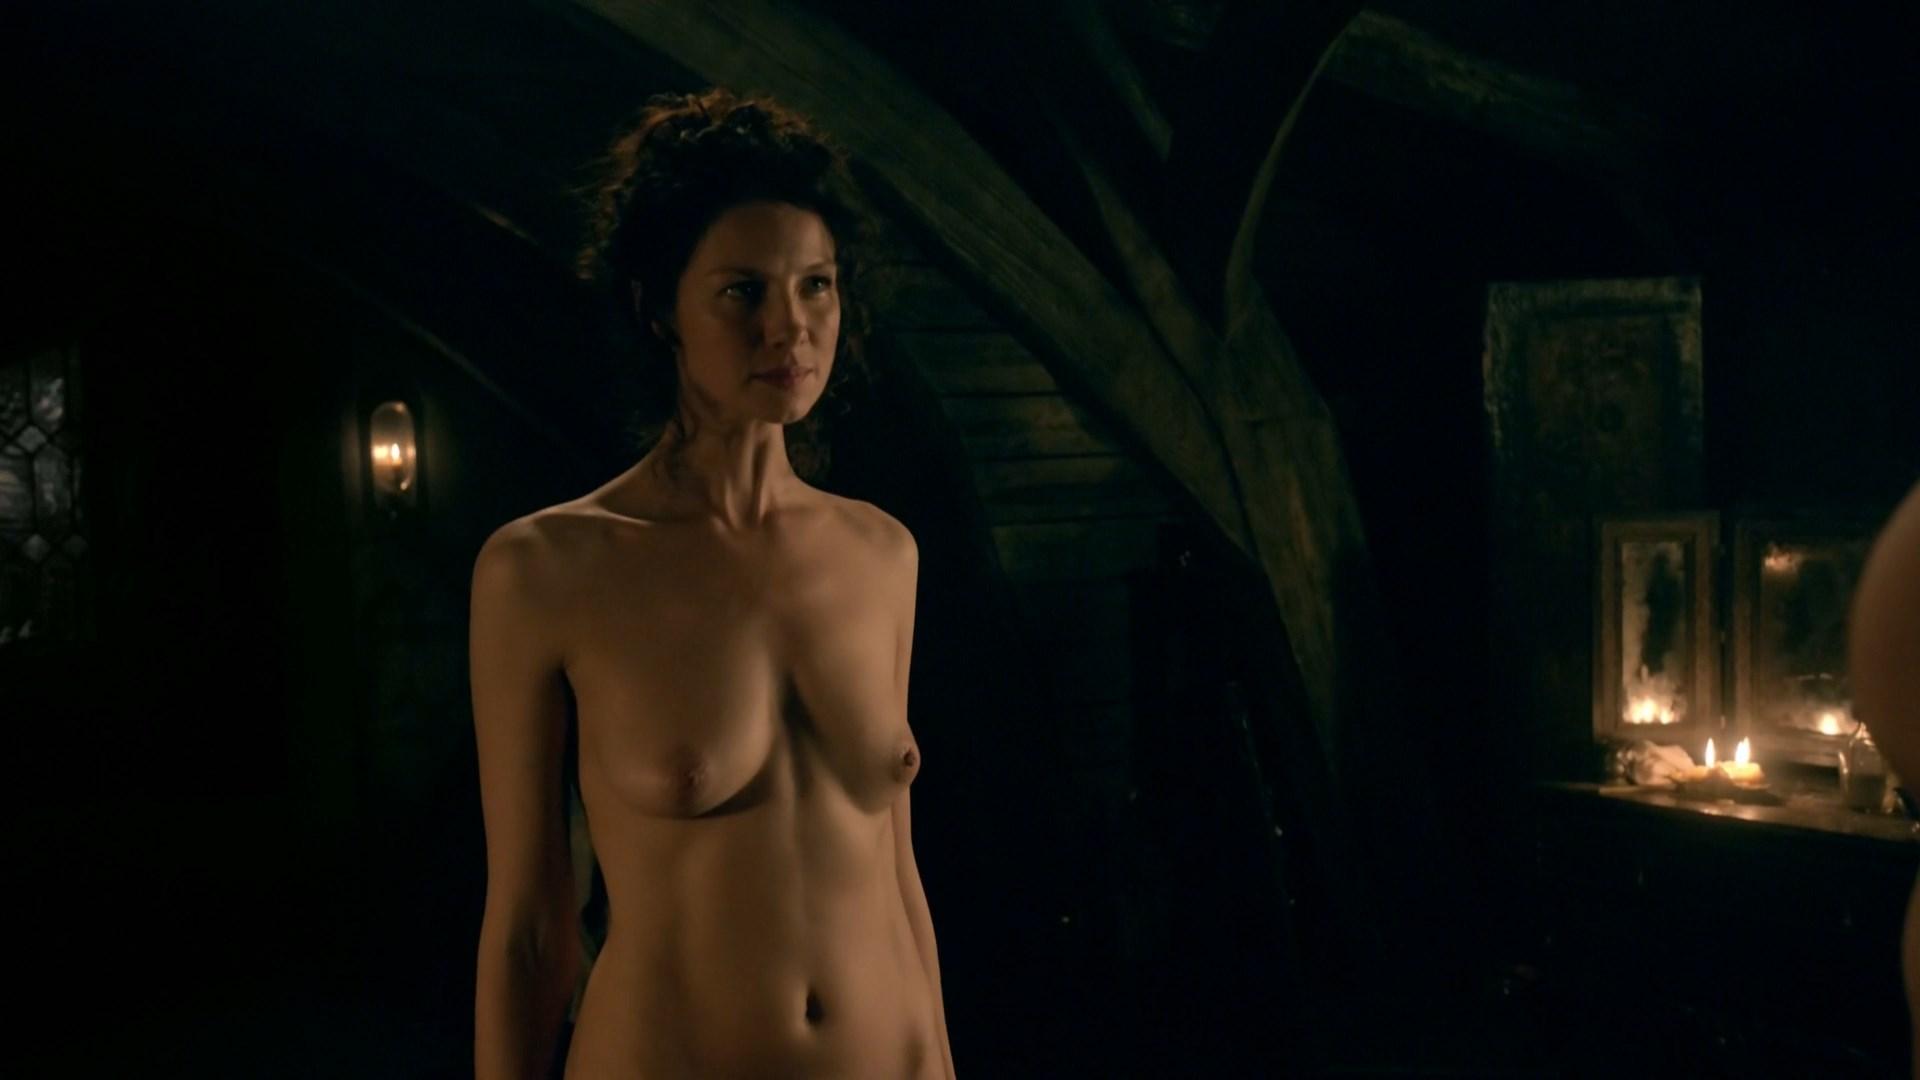 Watch Caitriona balfe nude outlander 2016 s02e04 hd 720p video